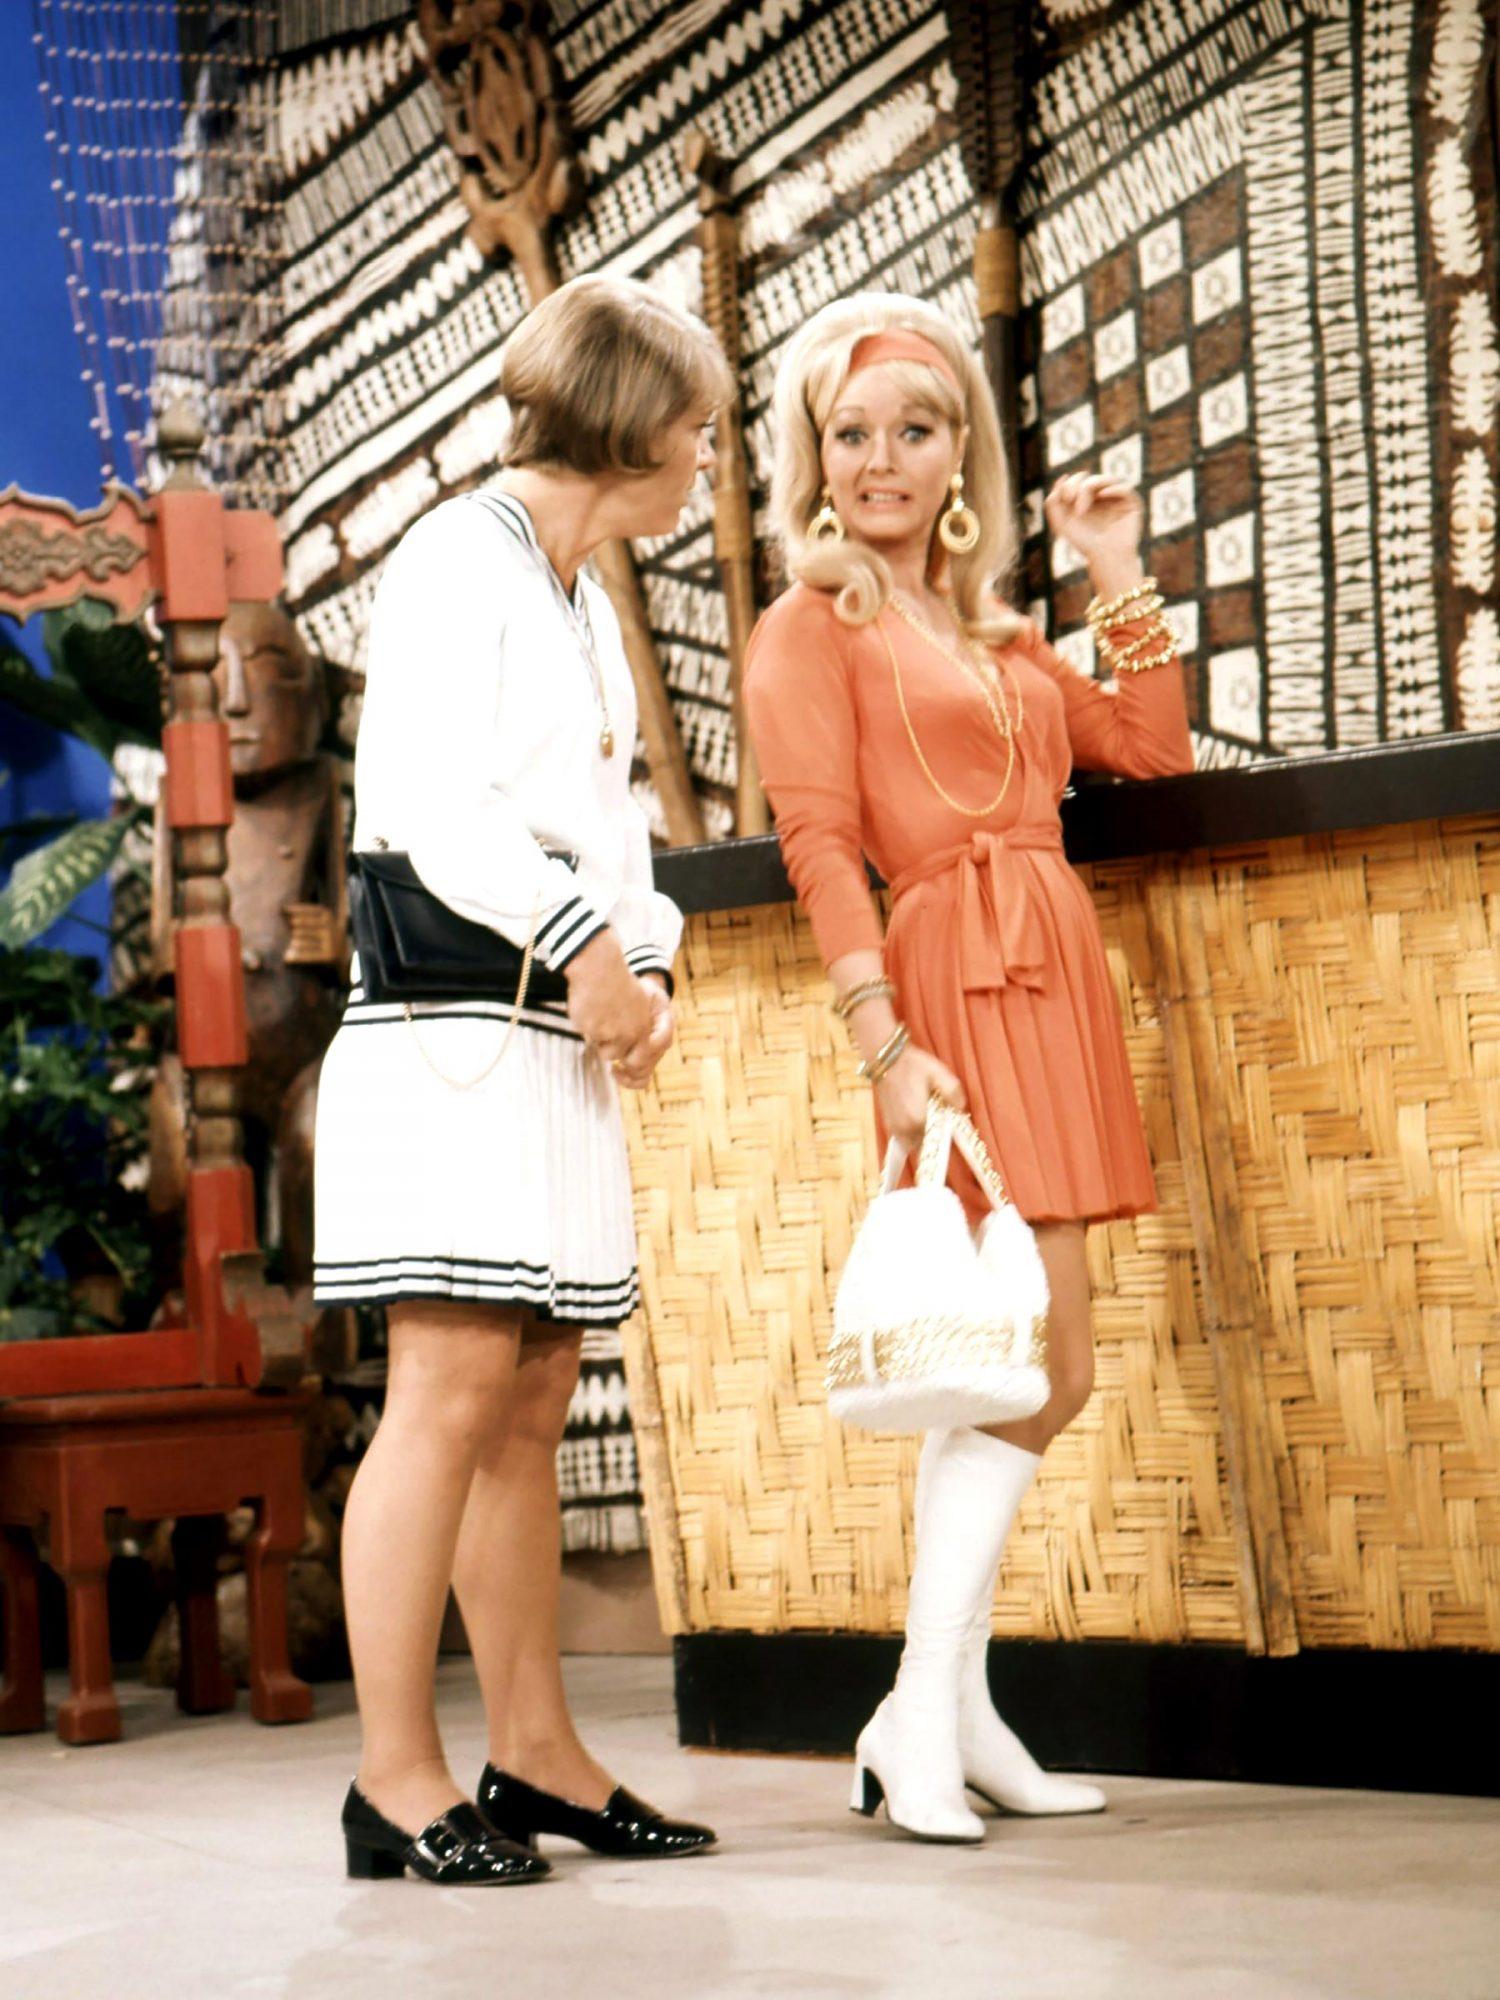 THE DEBBIE REYNOLDS SHOW, from left: Patricia Smith, Debbie Reynolds, 1969-70